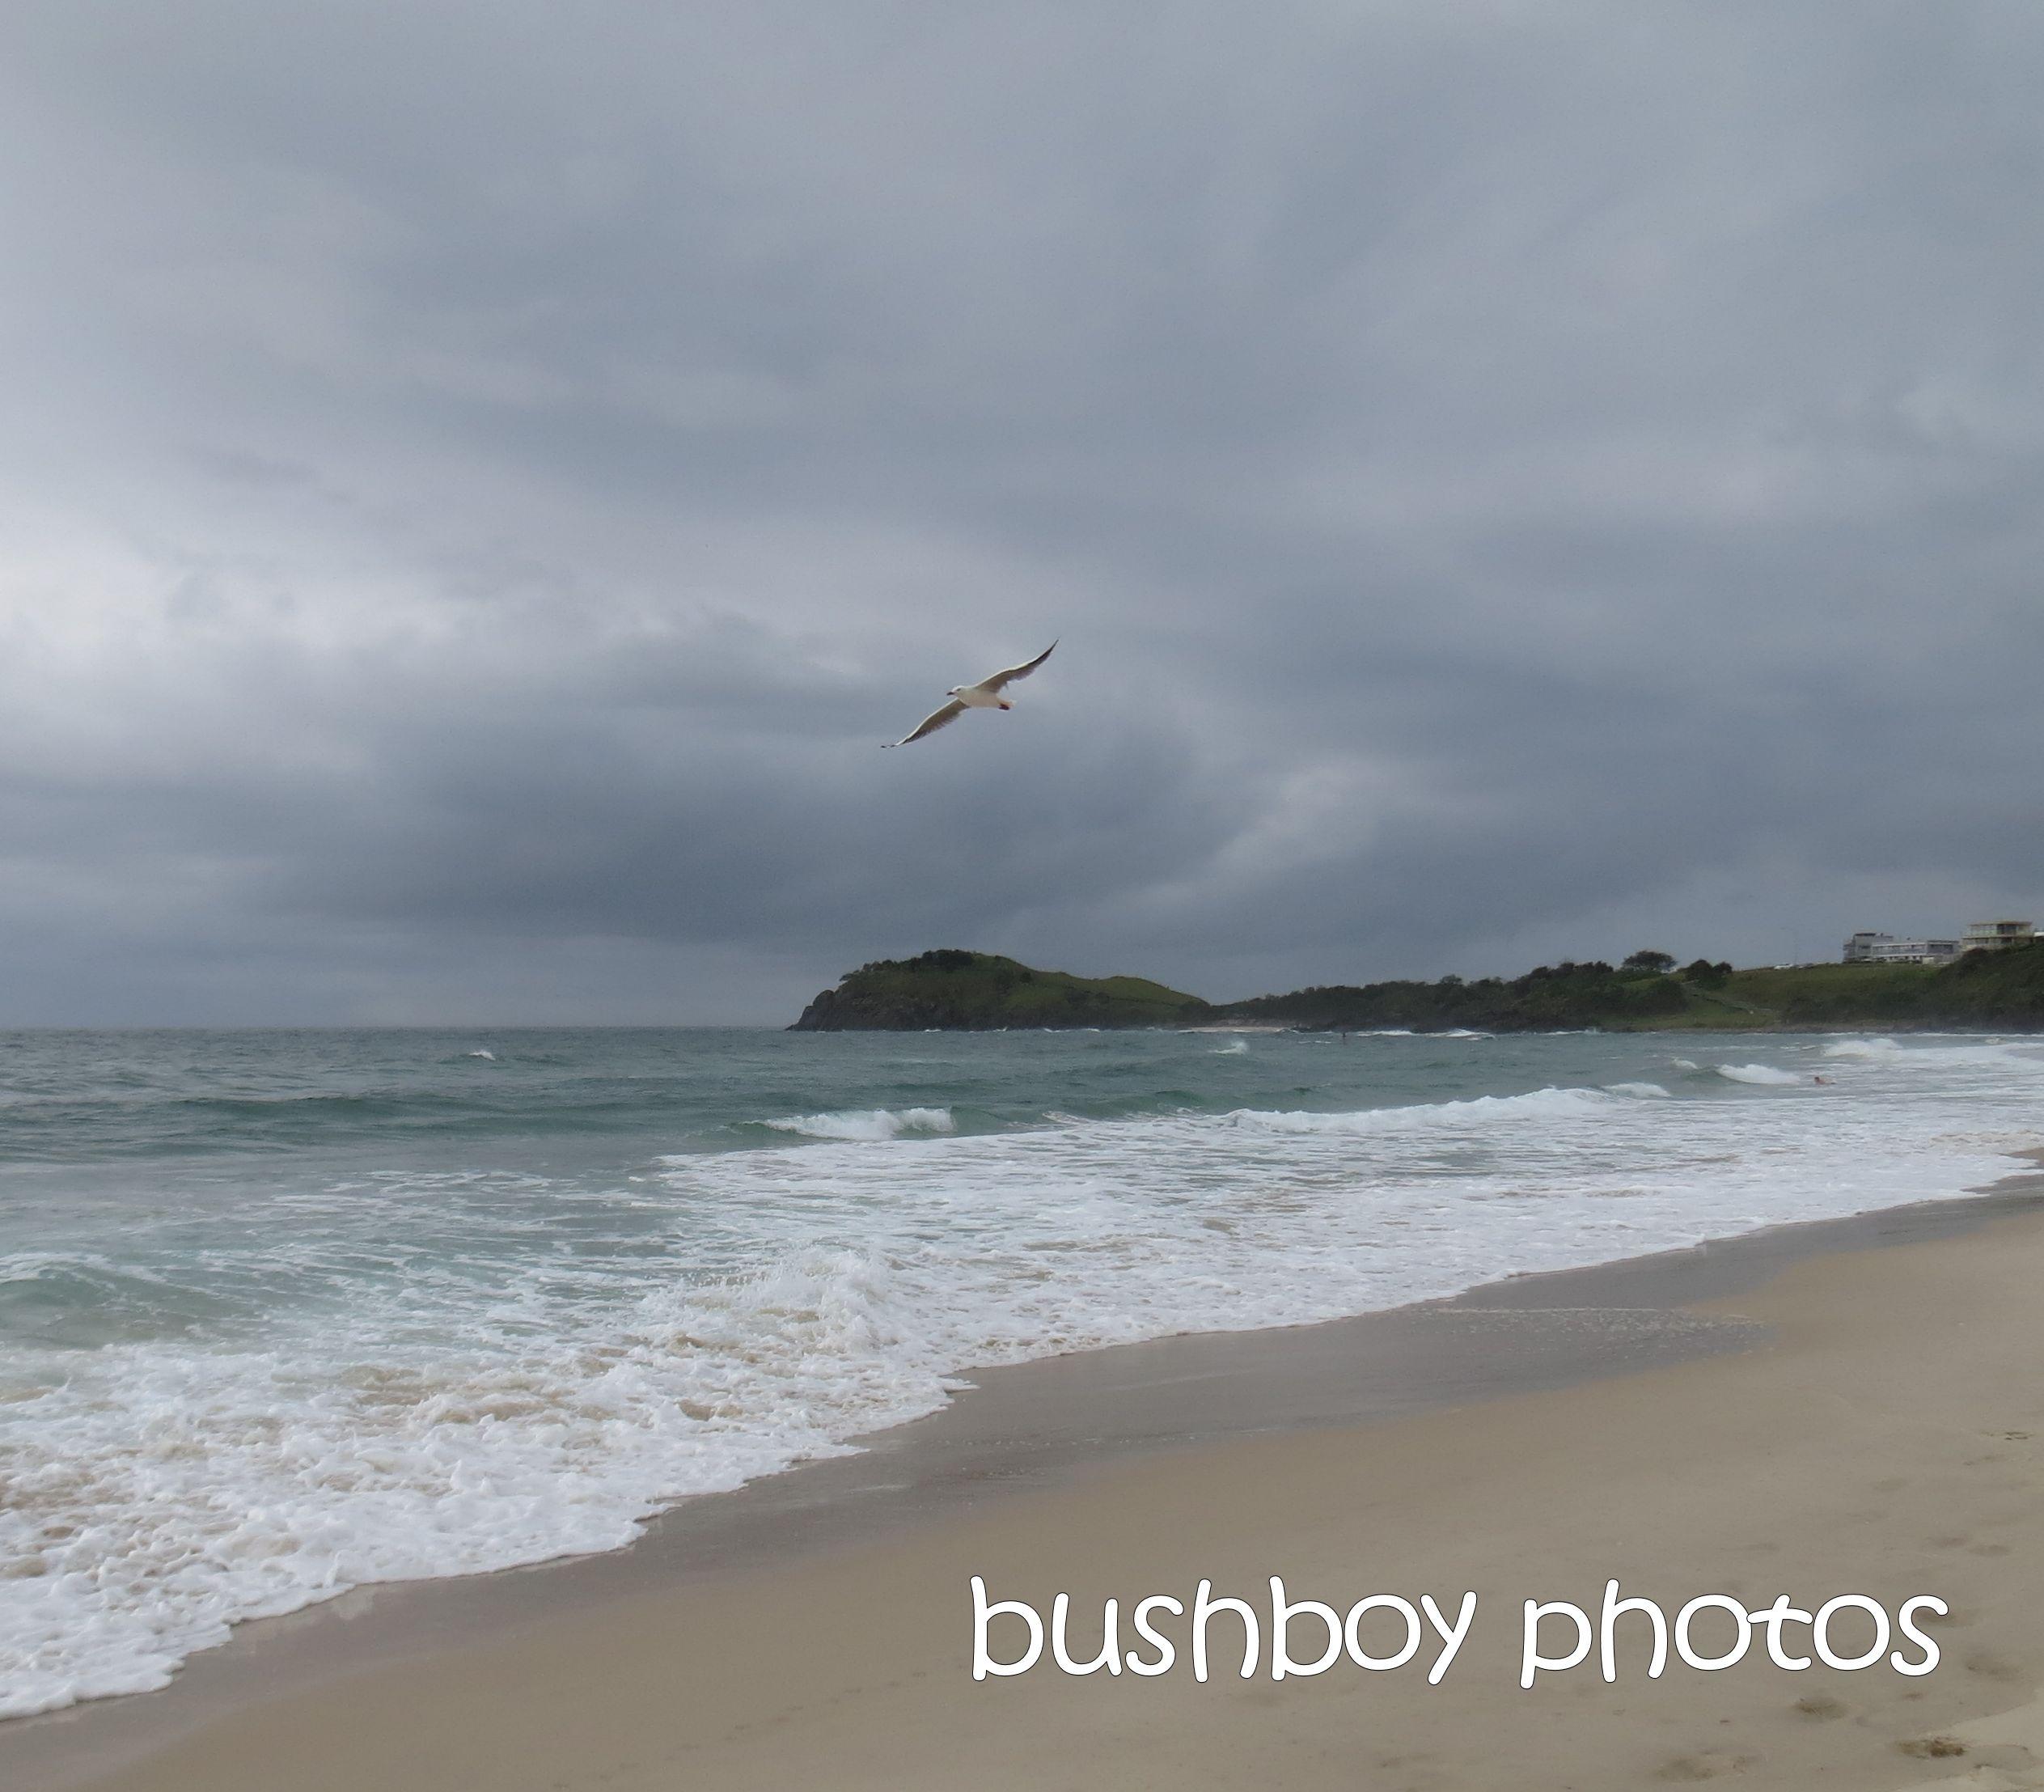 seagul flying_named_cabarita beach_march 2015